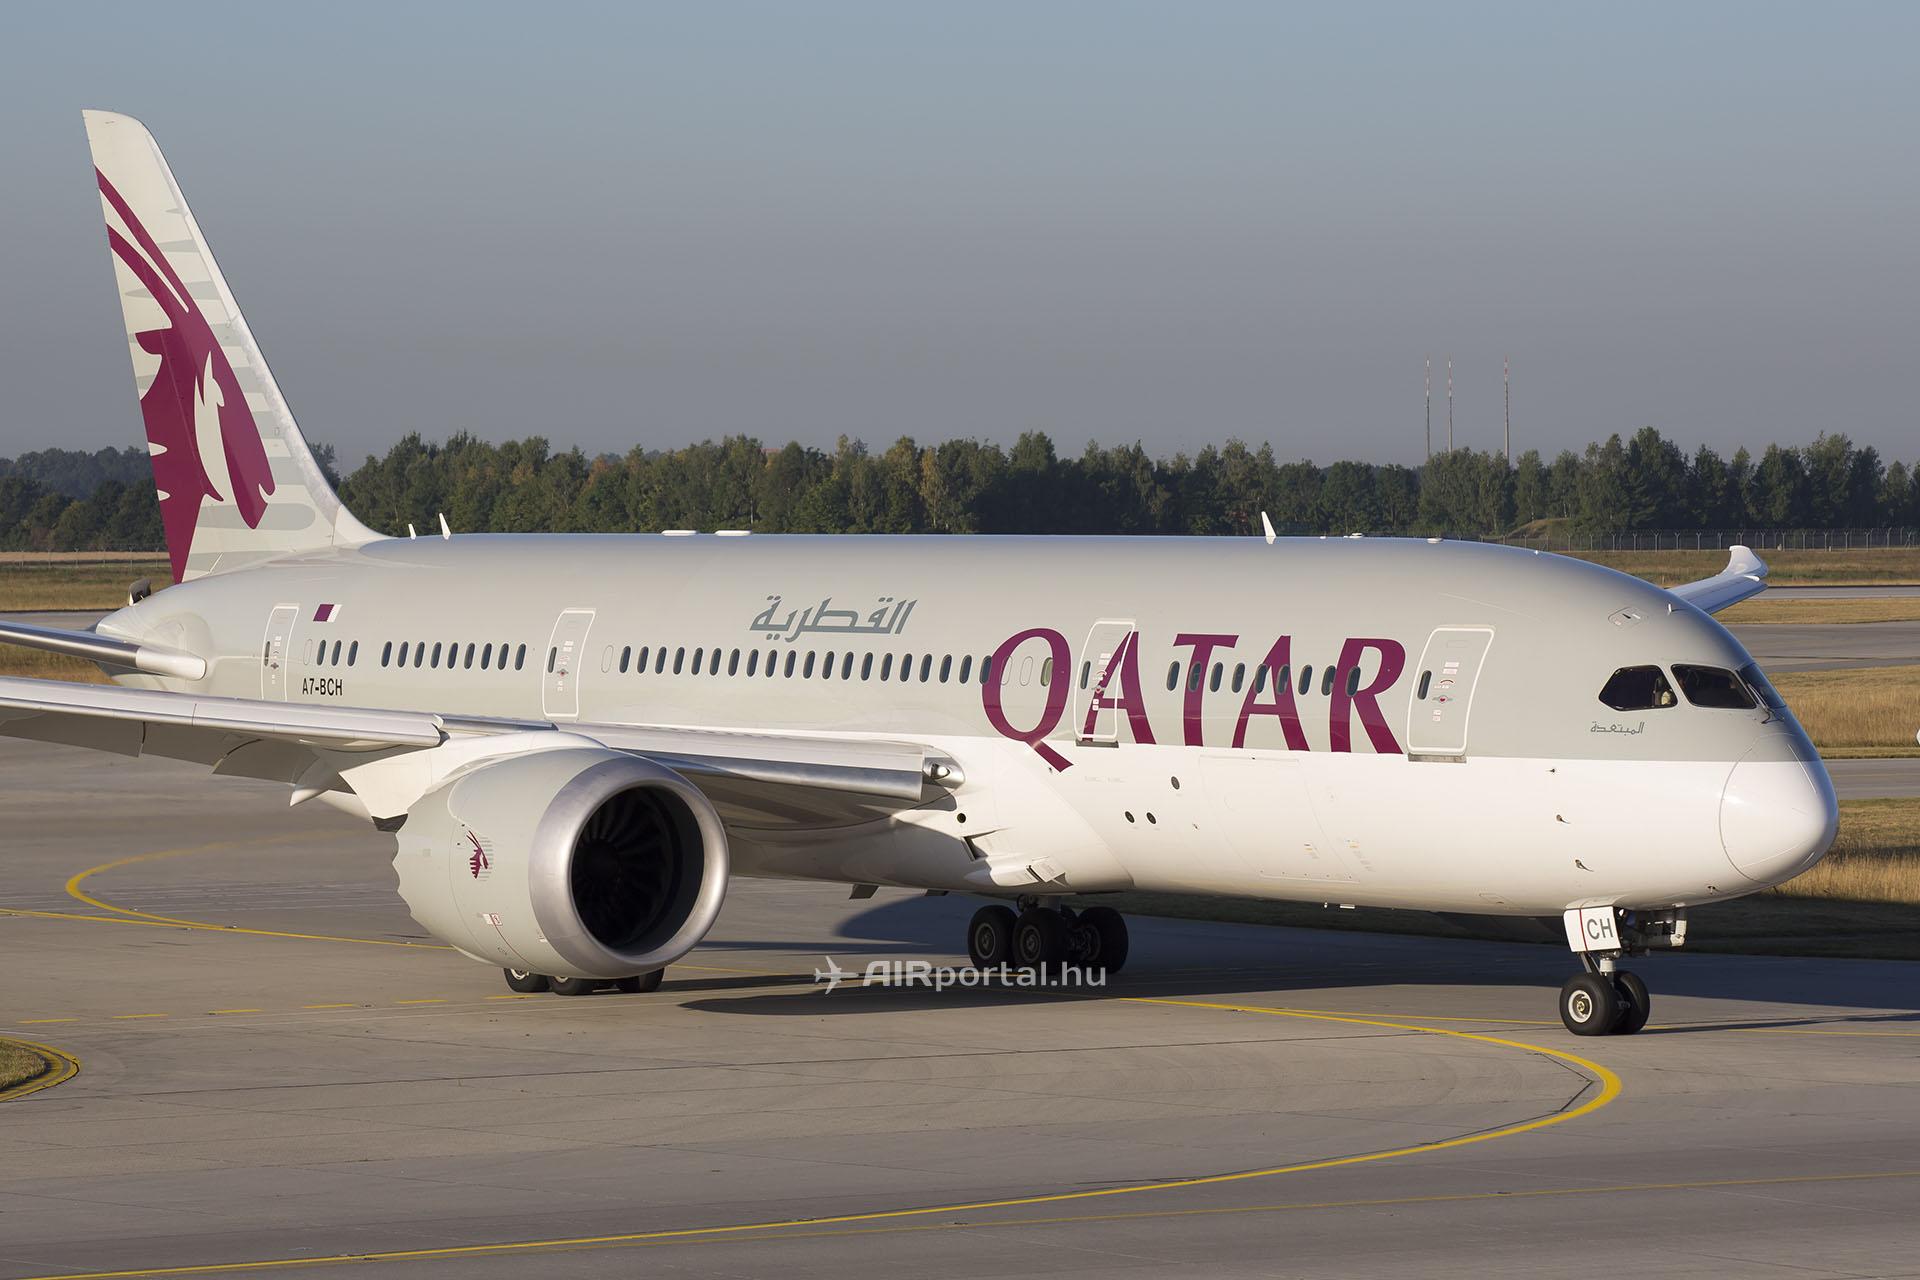 A Qatar Airways egyik Boeing 787 Dreamliner repülőgépe. (Fotó: AIRportal.hu)   © AIRportal.hu